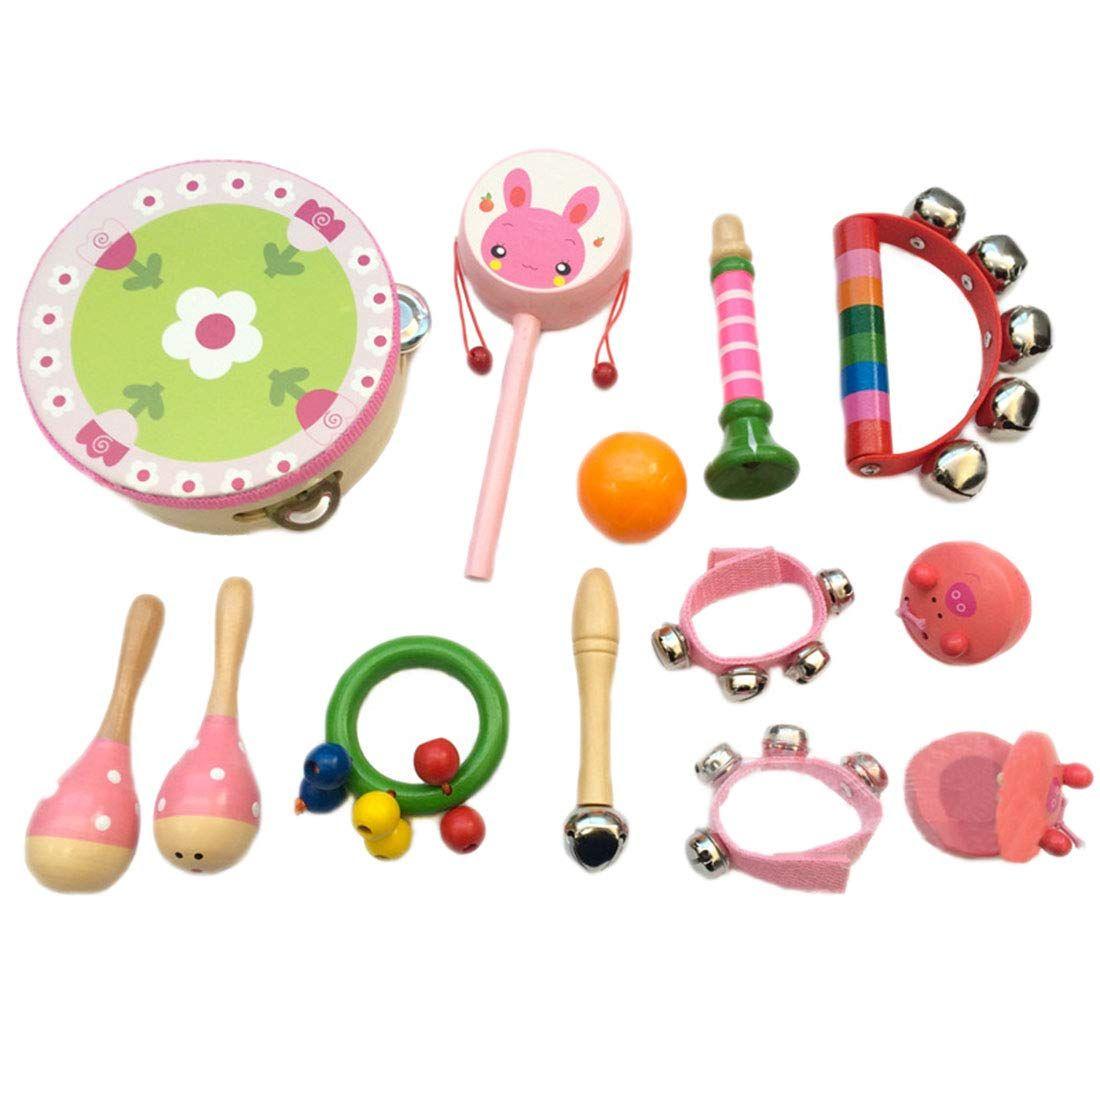 Musicales 13pcs Percusion Instrumentos Infantiles Yvsoo LUzVpMGqS